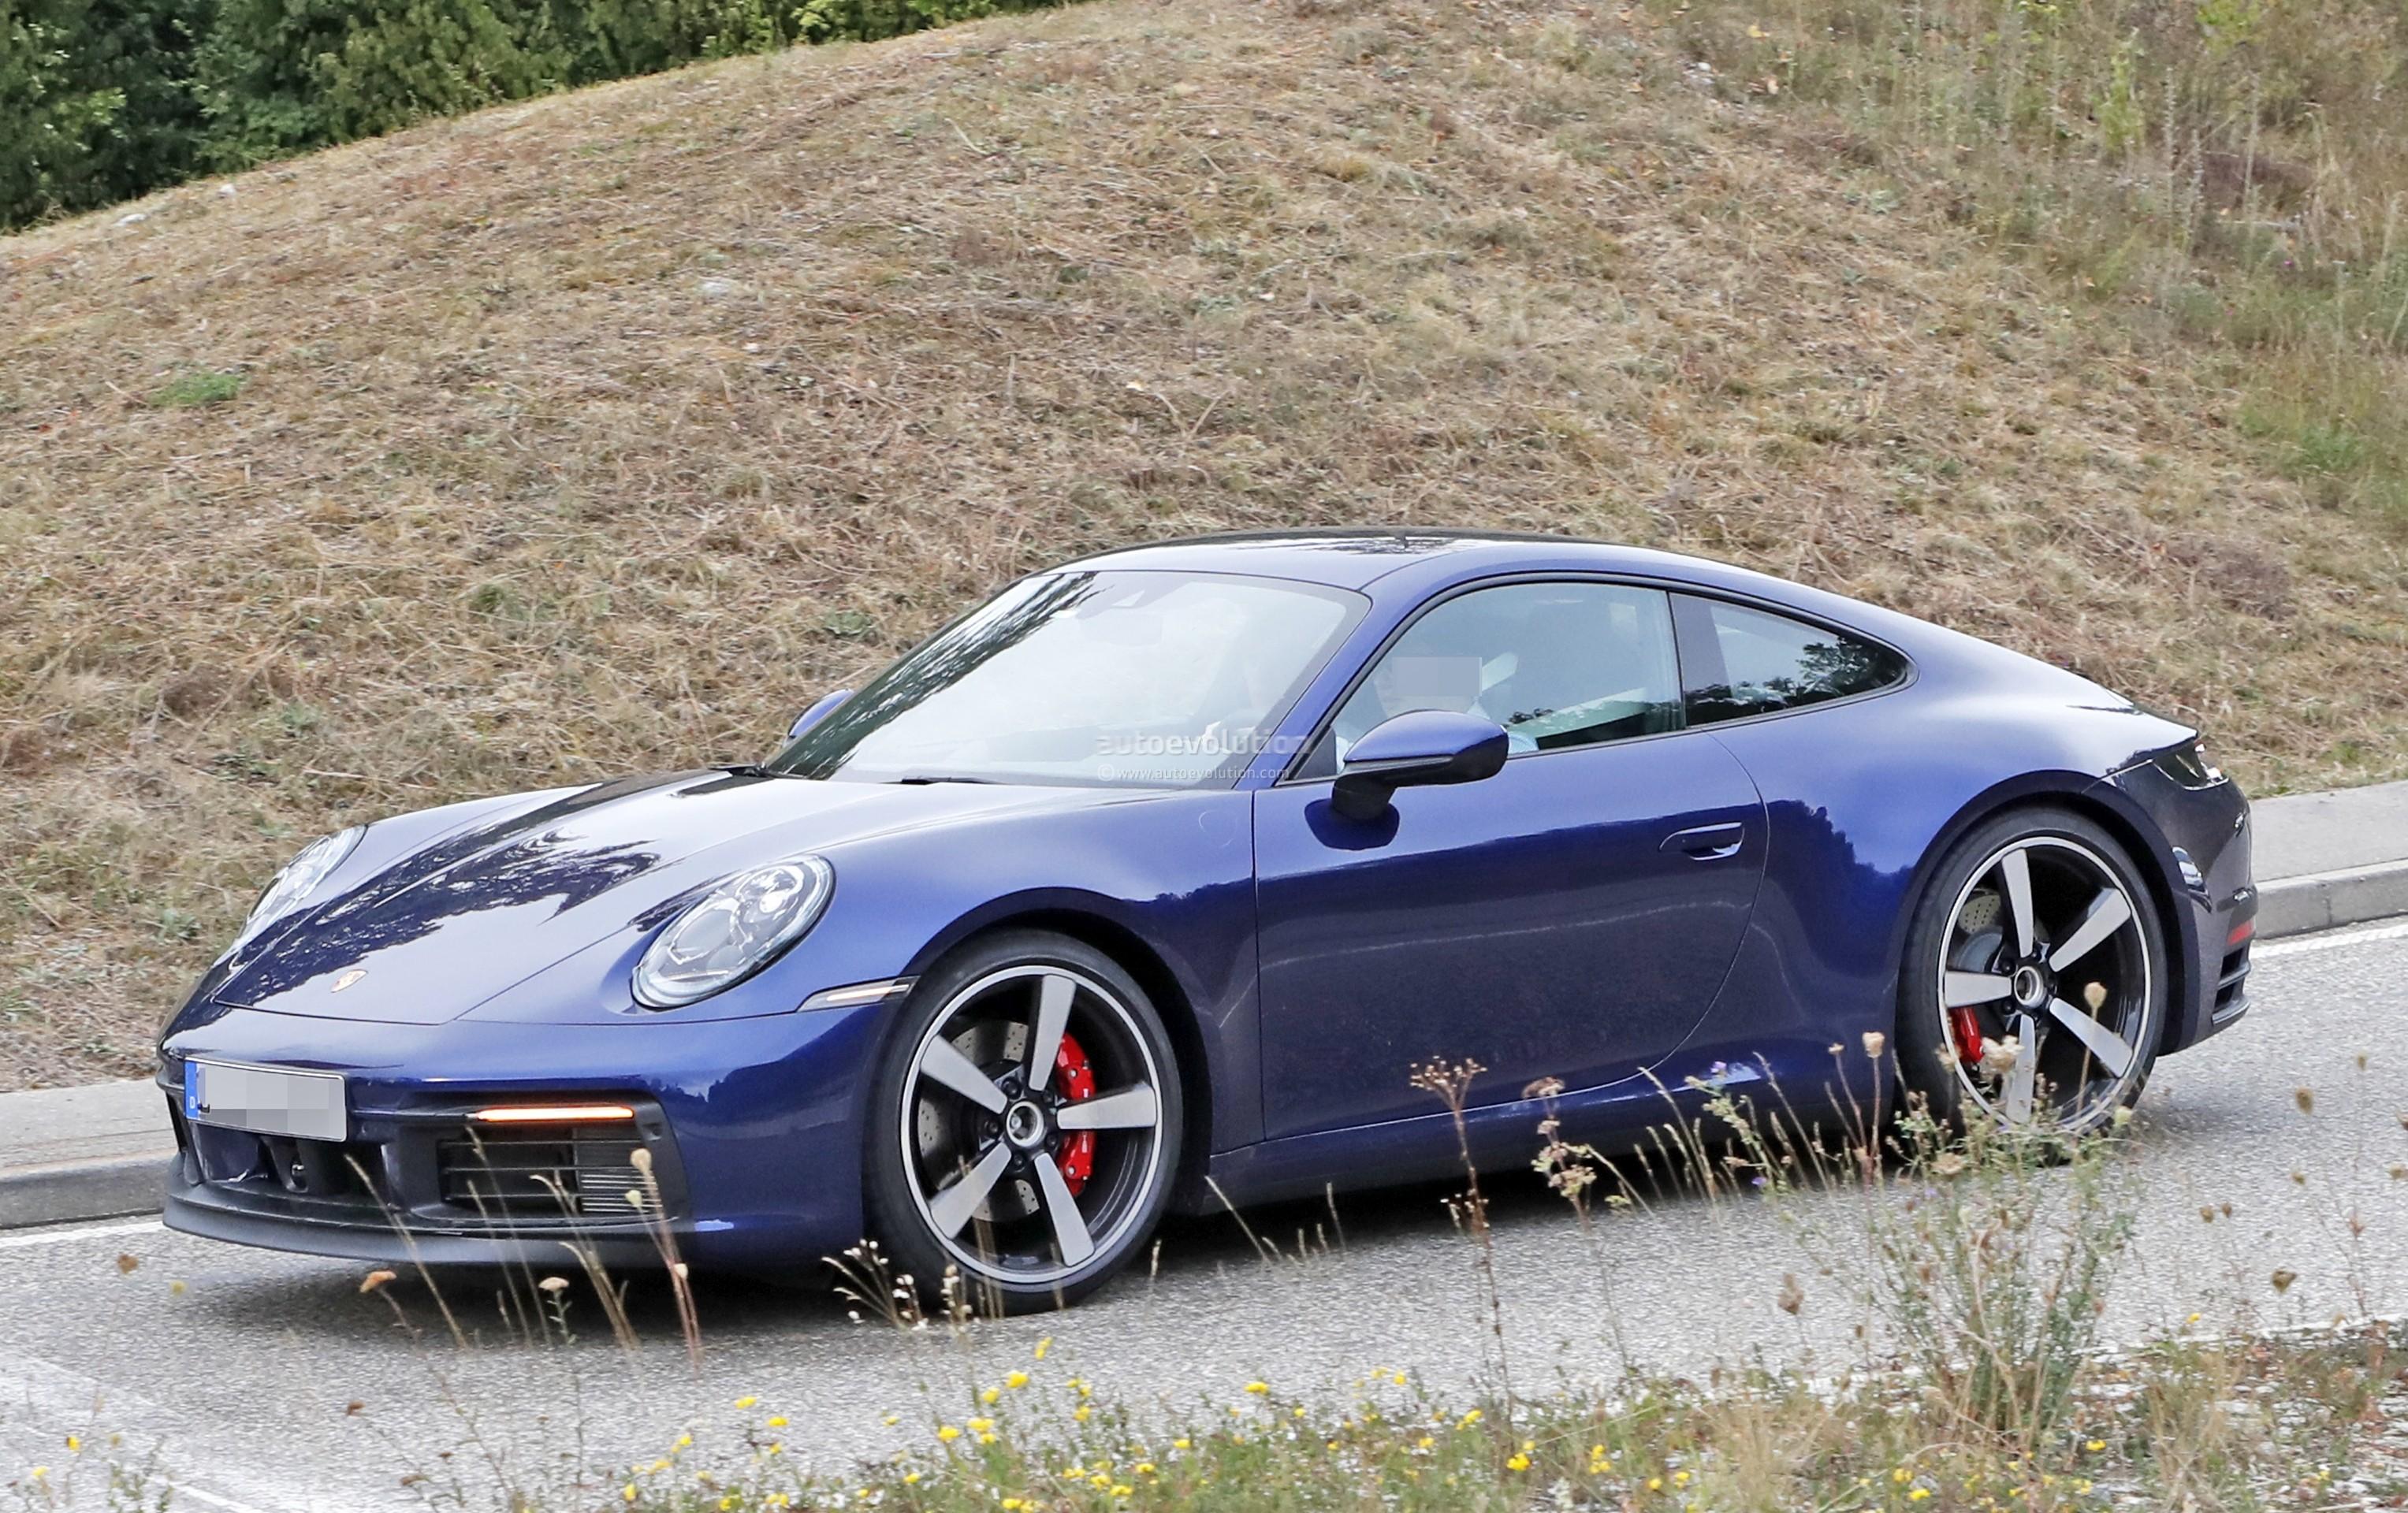 2020 Porsche 911 Looks Like a Modern 993 - autoevolution